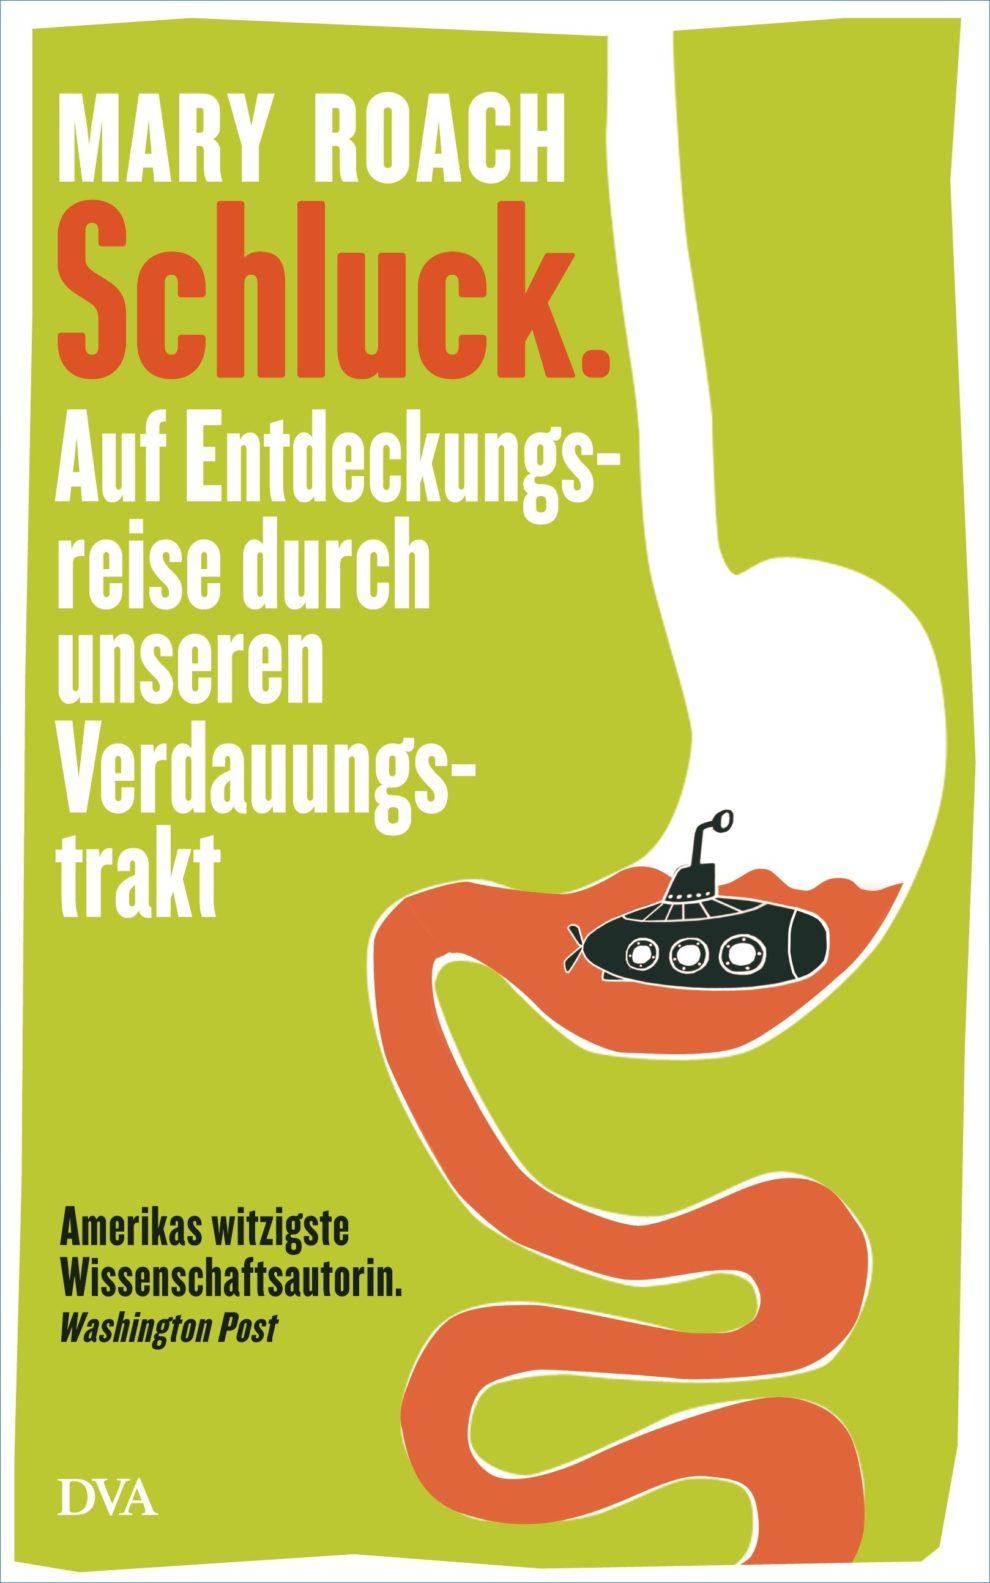 B-09-14 Schluck.jpg